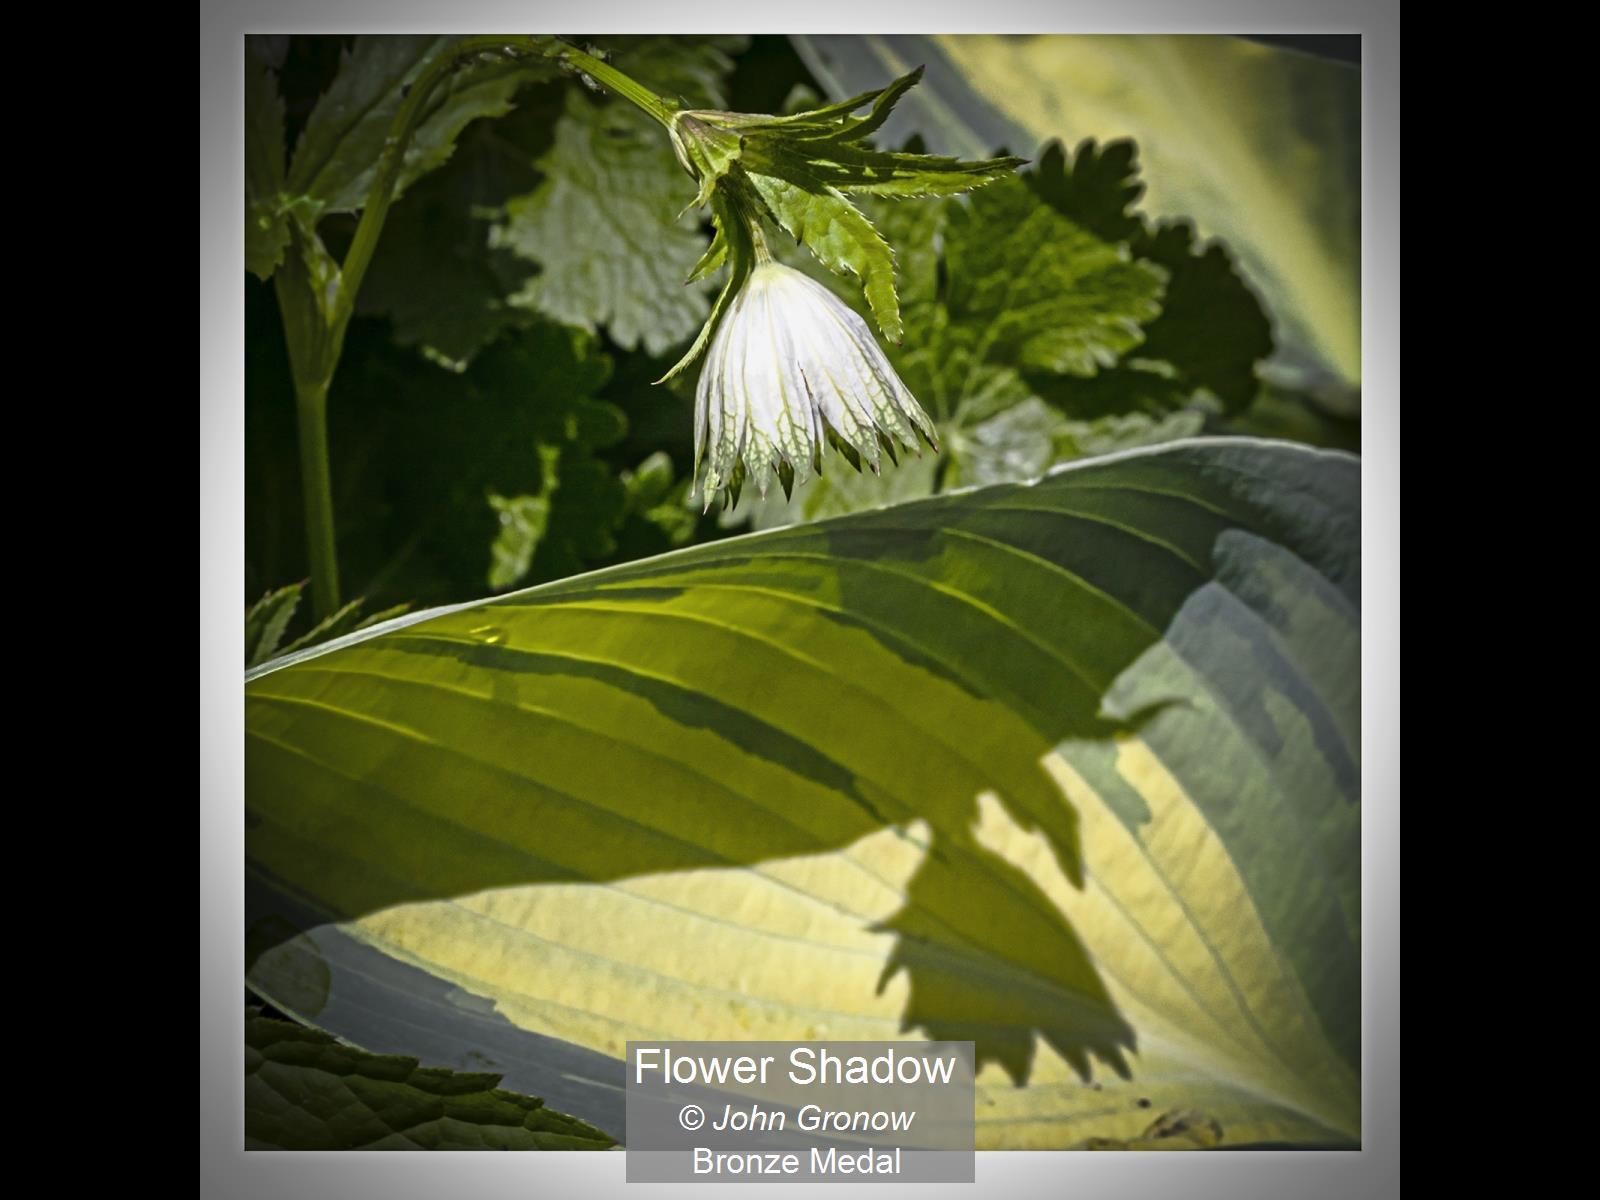 Flower Shadow_John Gronow_Bronze